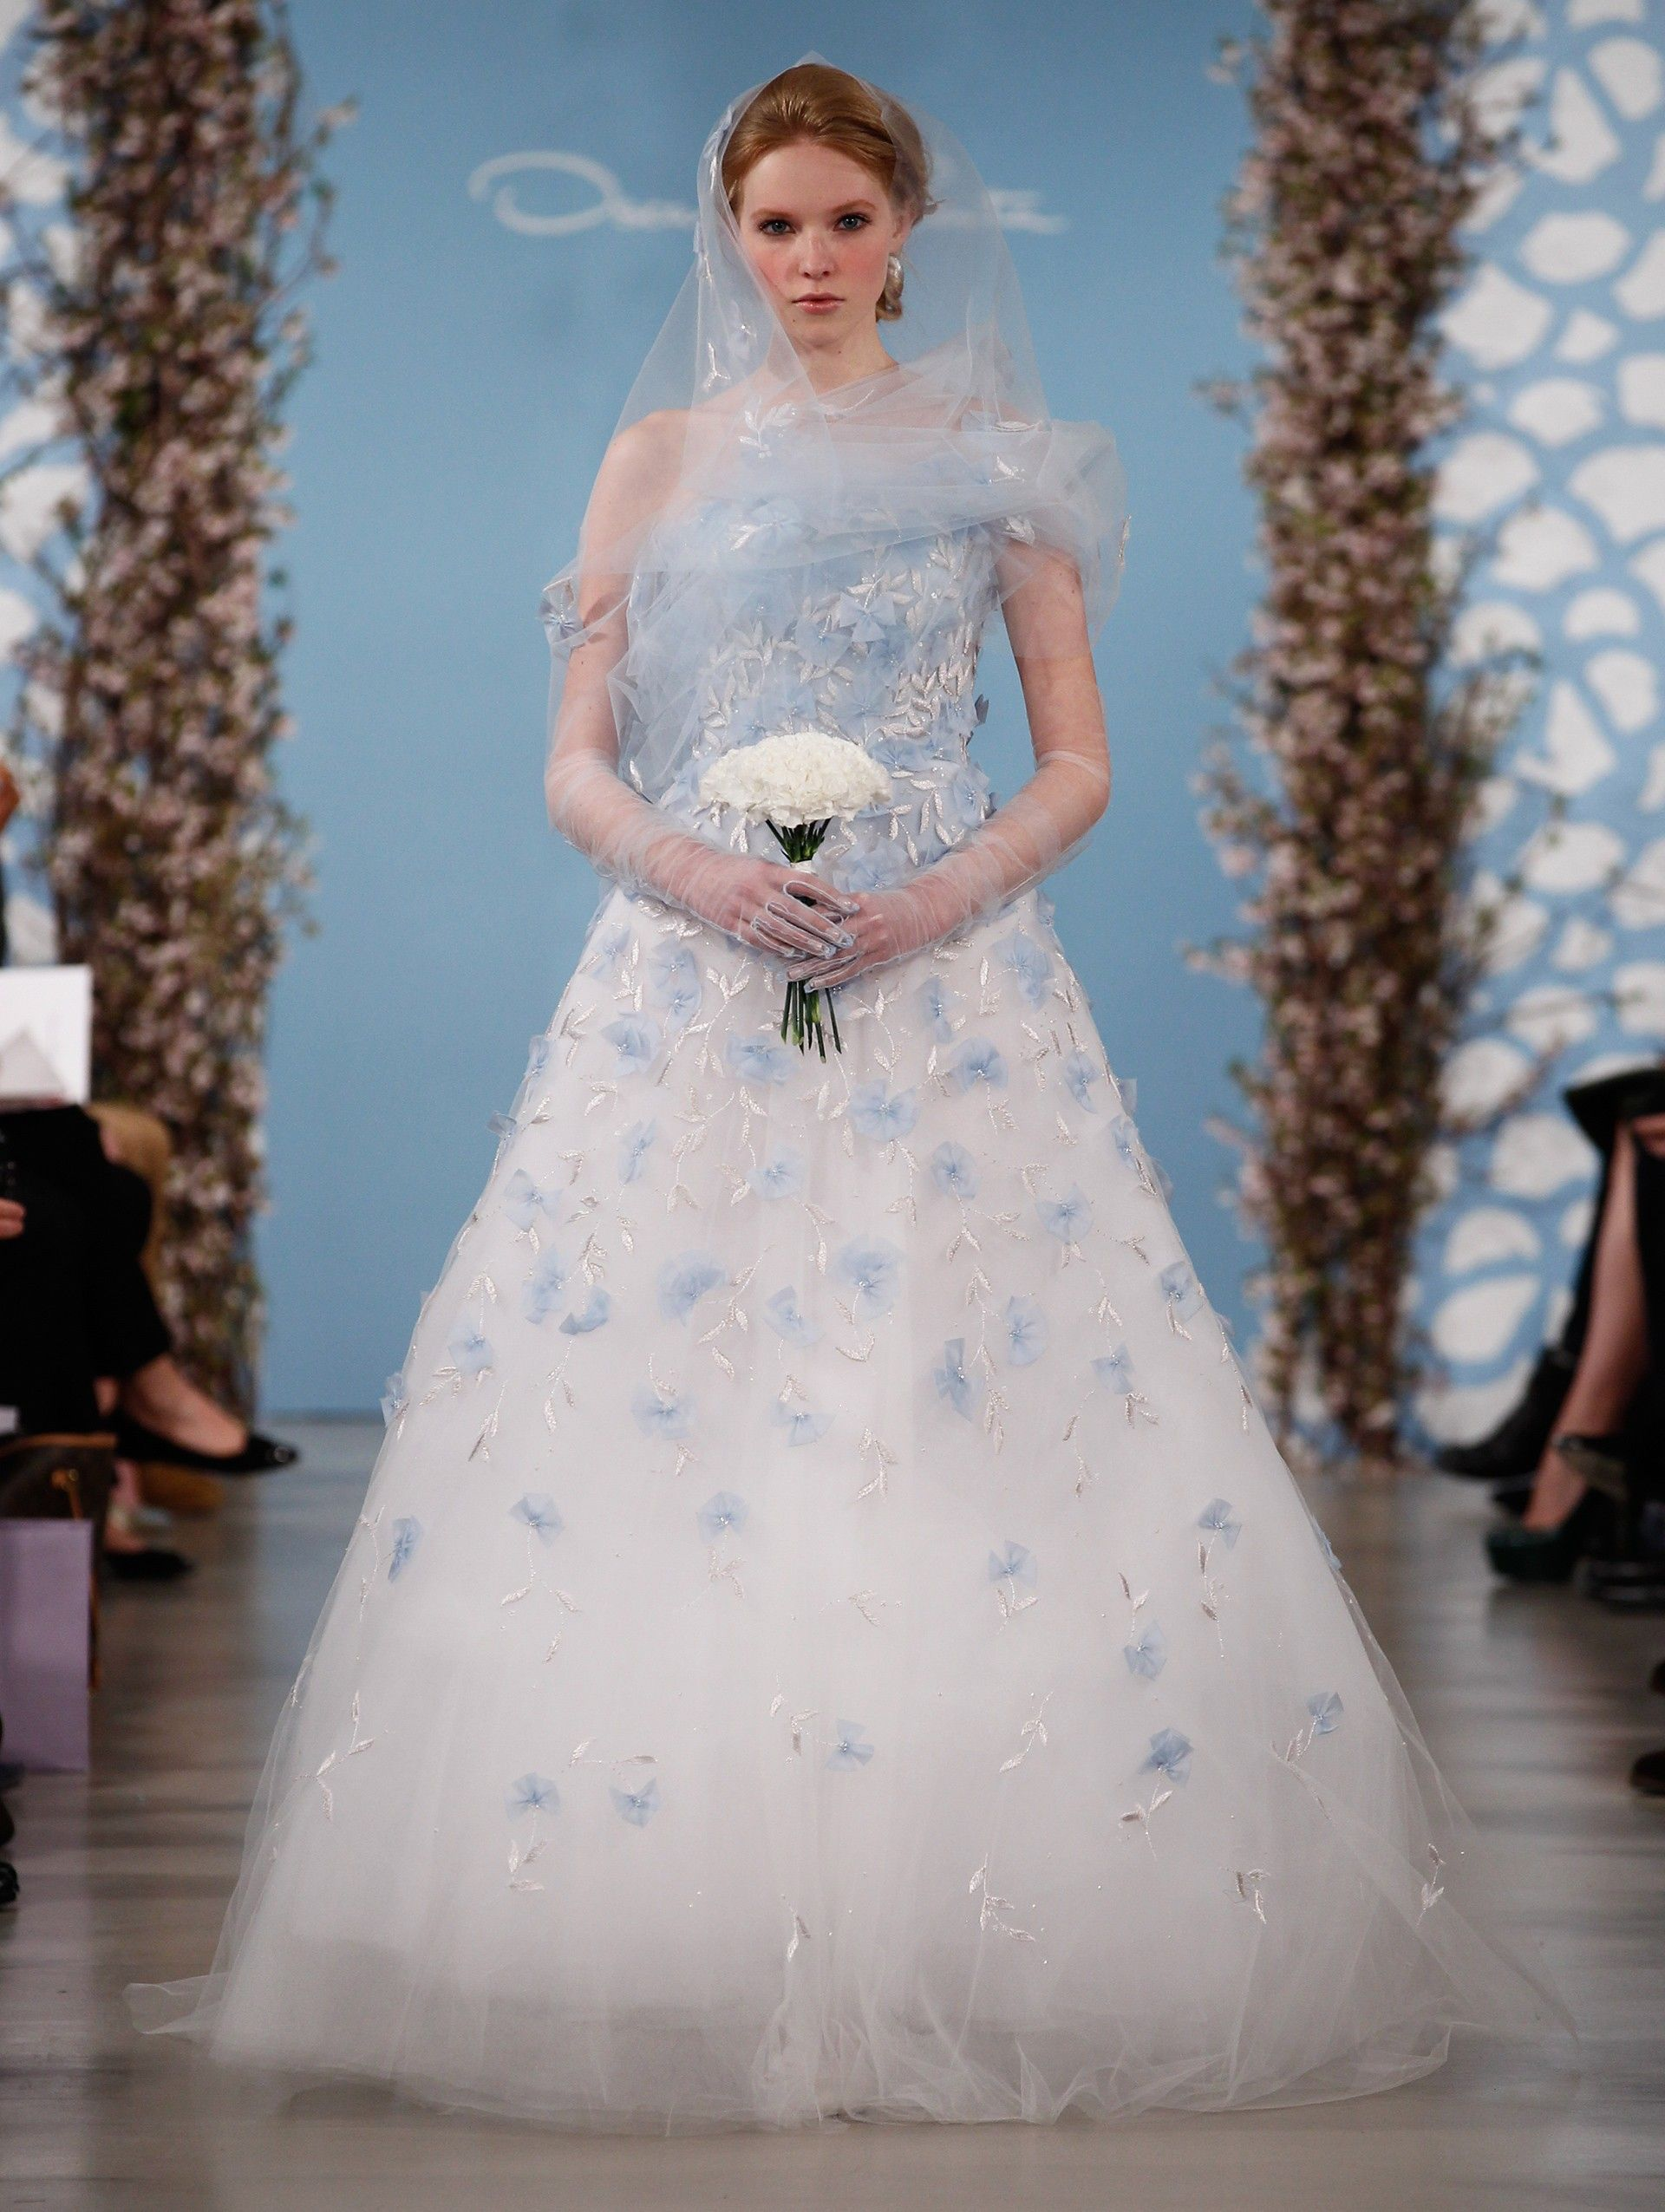 Oscar de la Renta | Wedding dresses | Pinterest | Oscar de la Renta